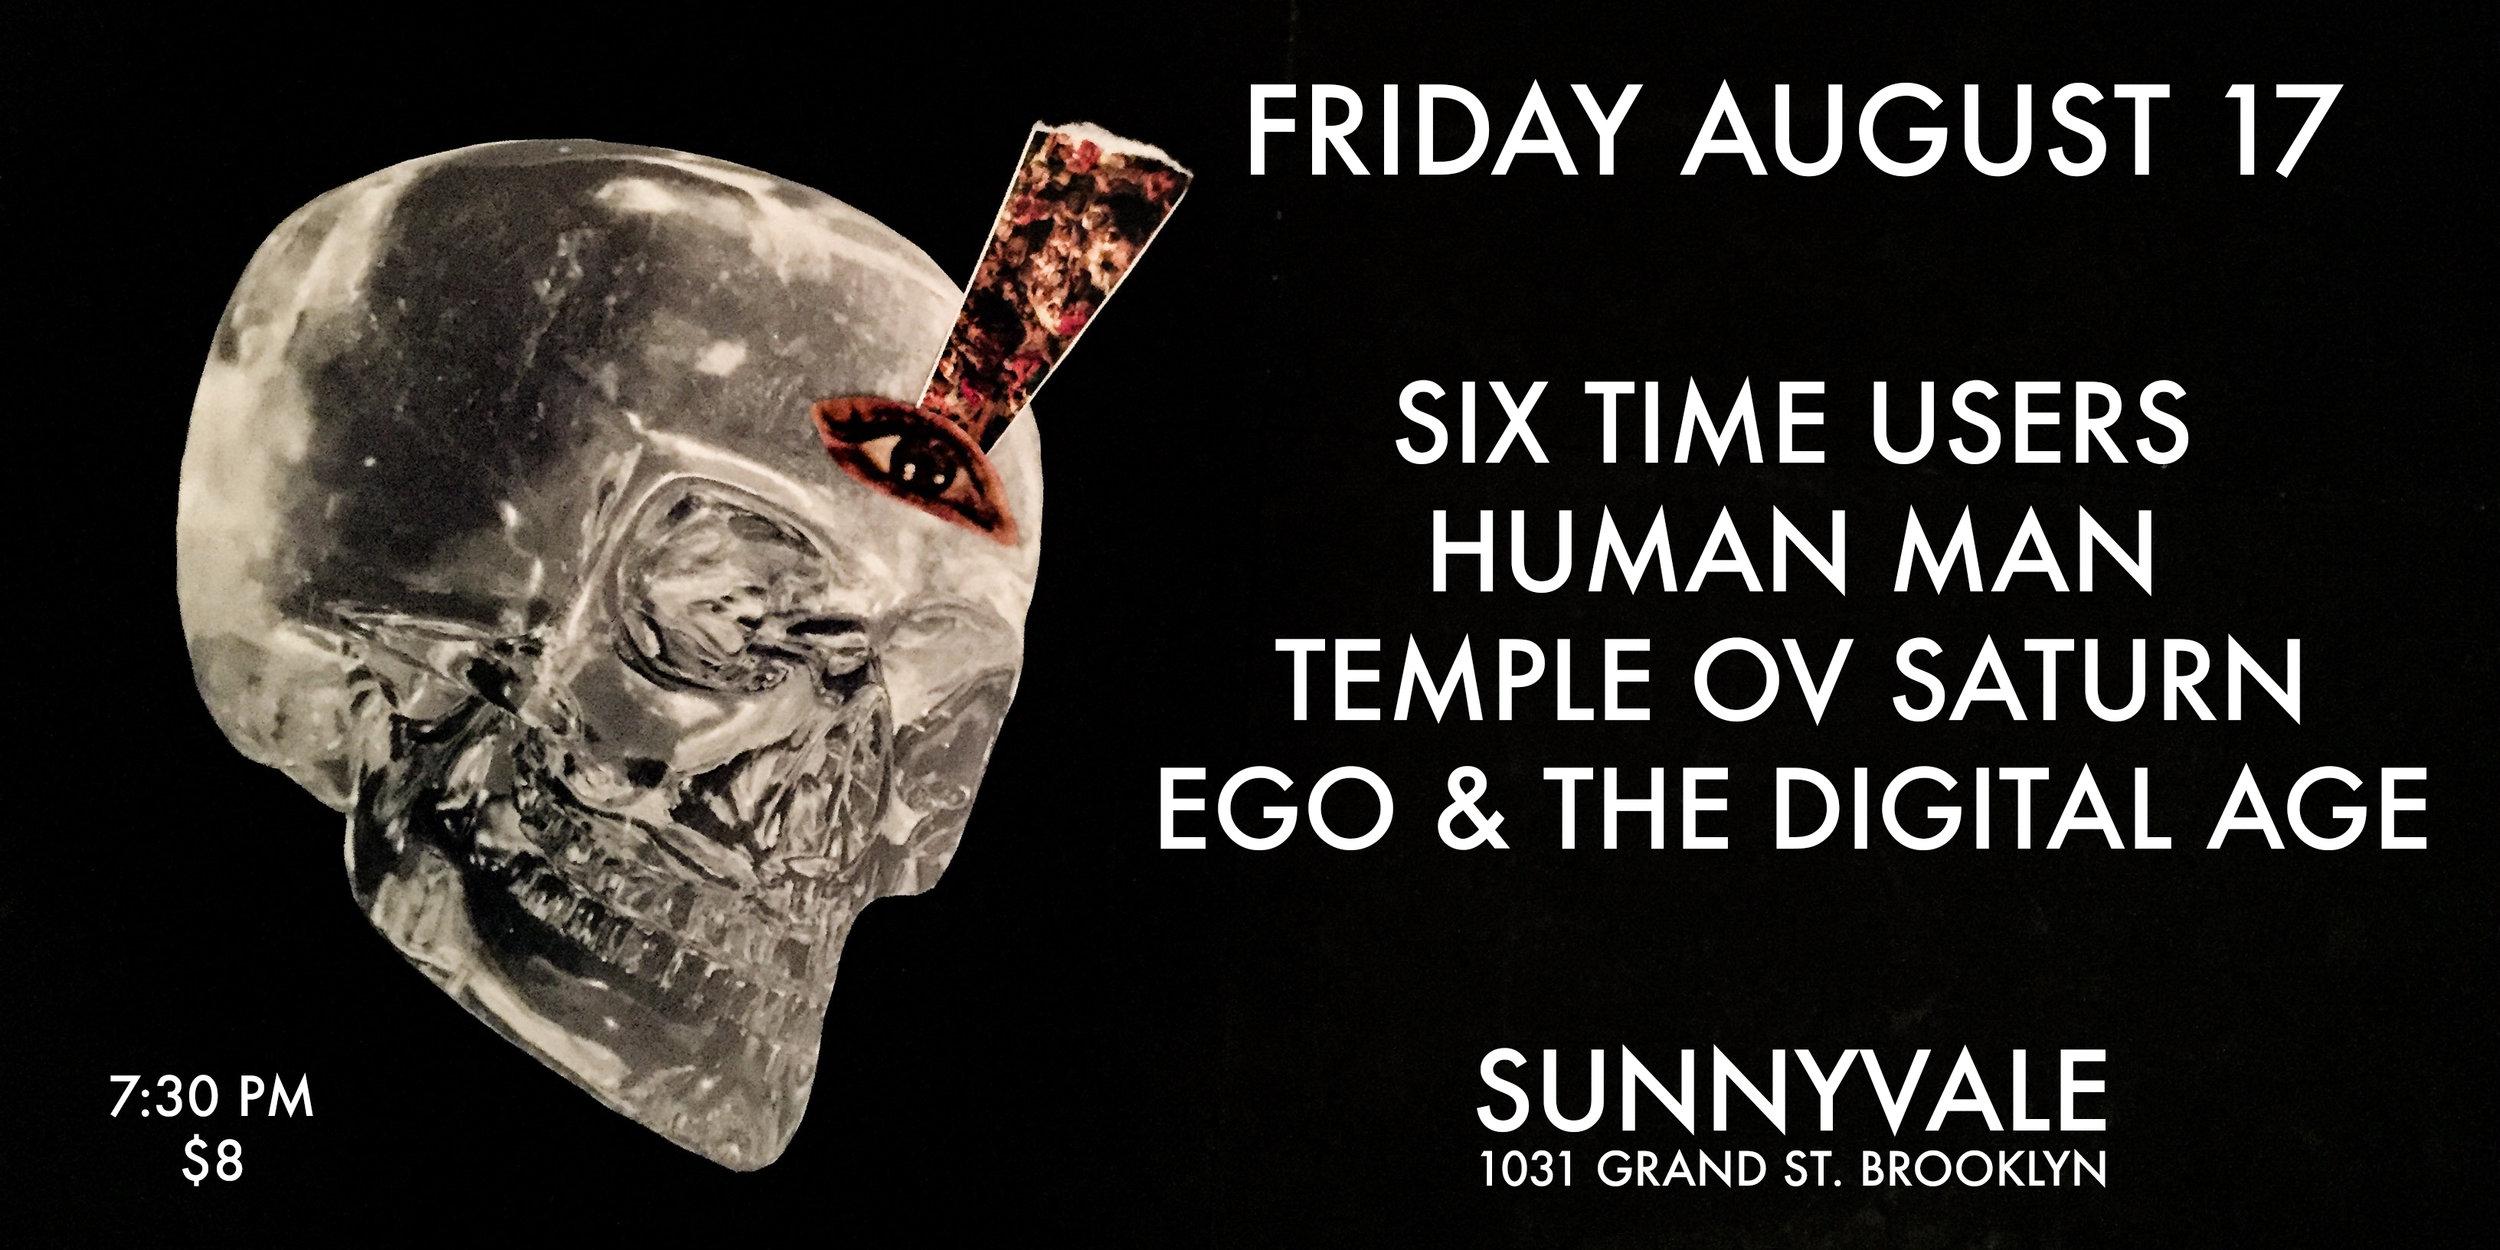 Temple Ov Saturn at Sunnyvale in Brooklyn on August 17, 2018